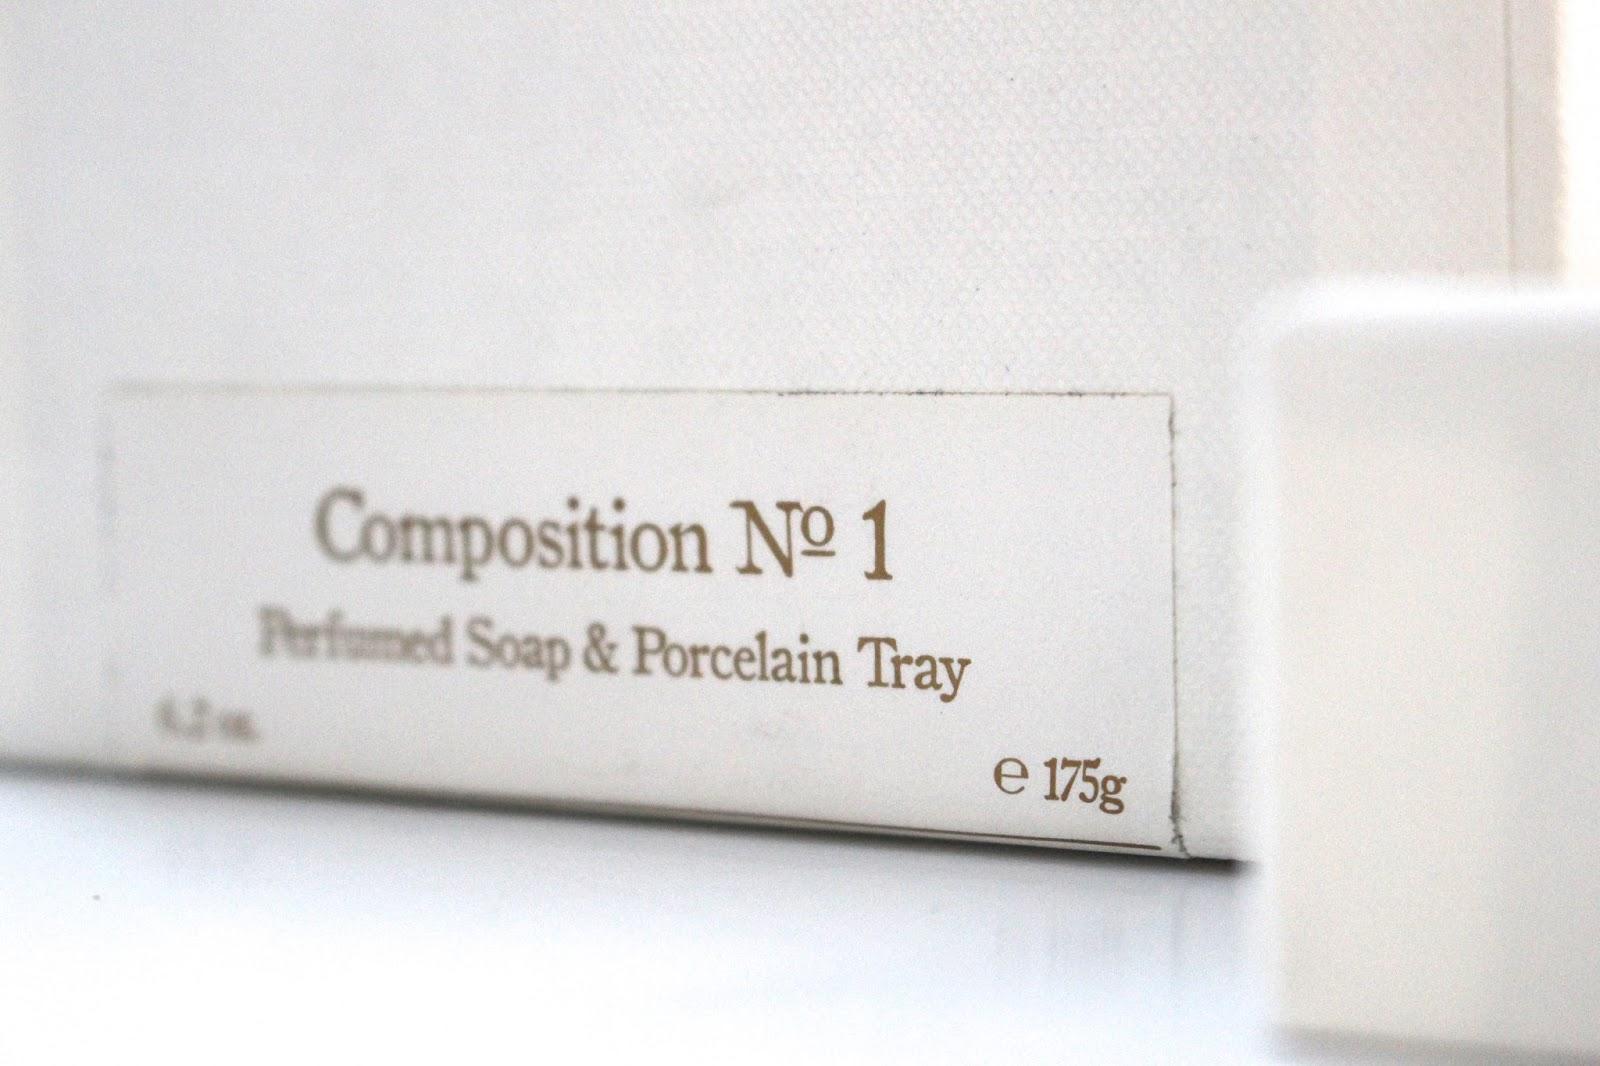 Joya Composition No 1 Soap